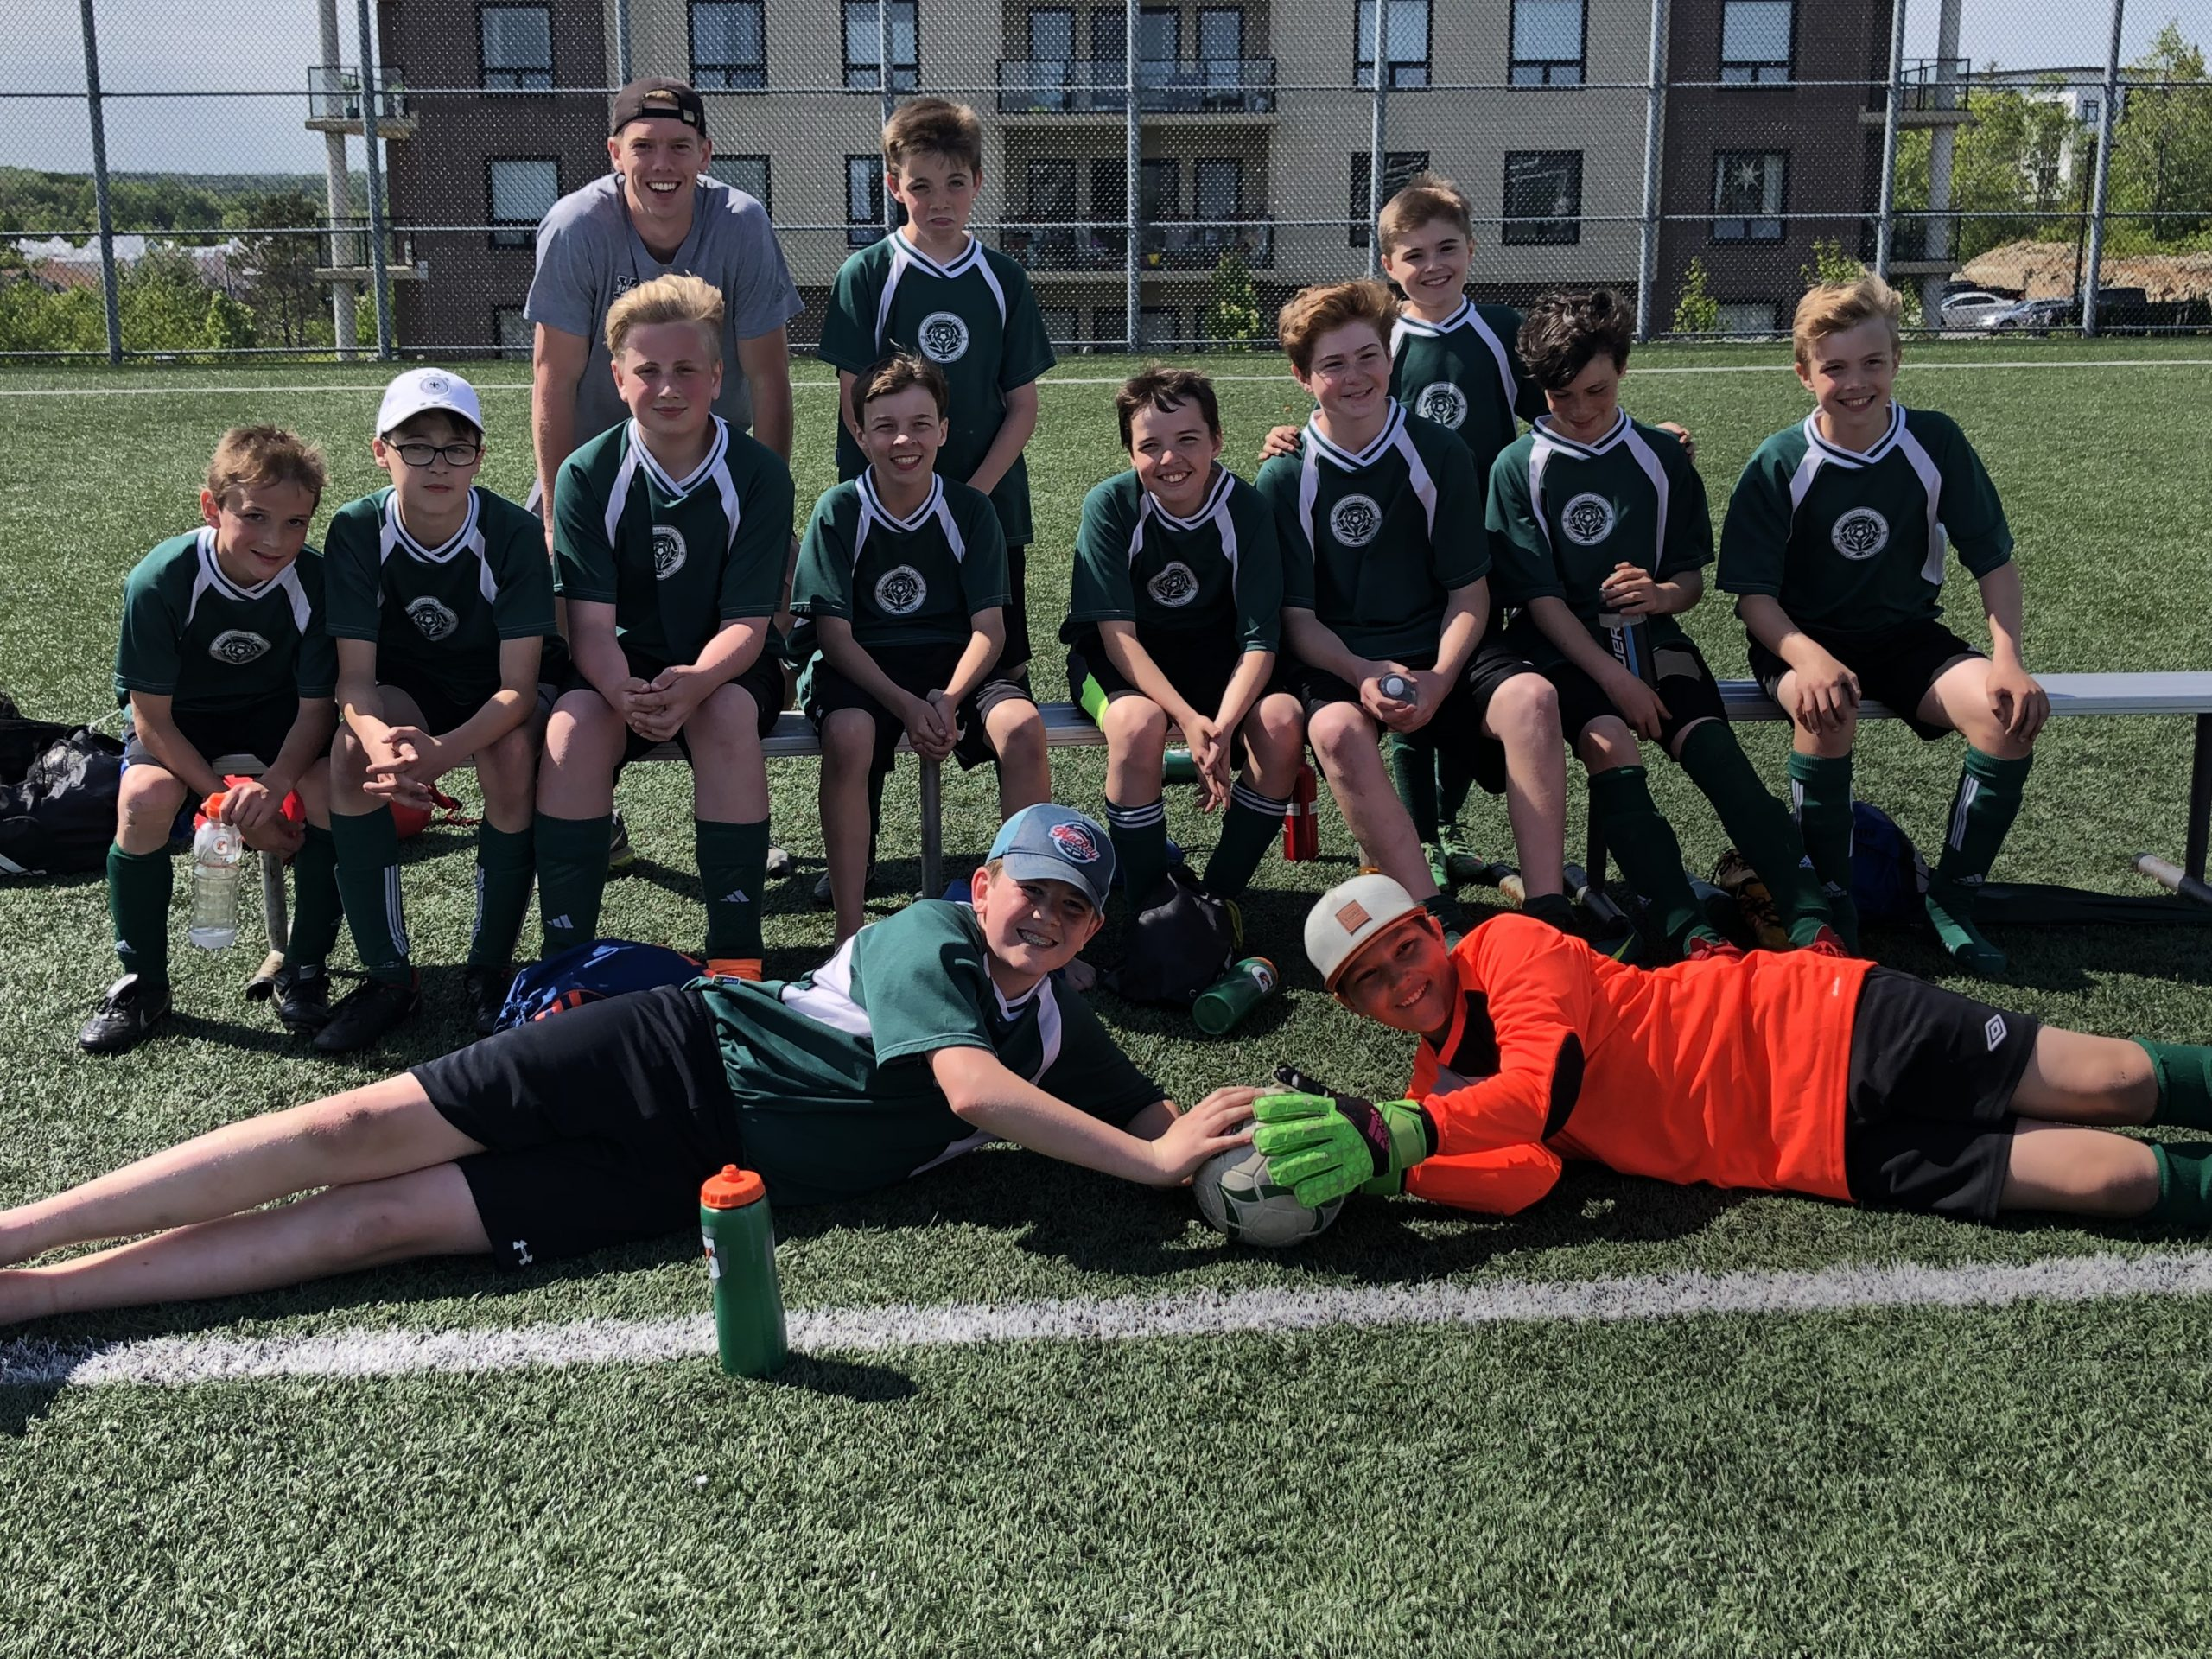 2018 Halifax Dunbrack Ratomir Soccer Tournament results (from Halifax Sunday)